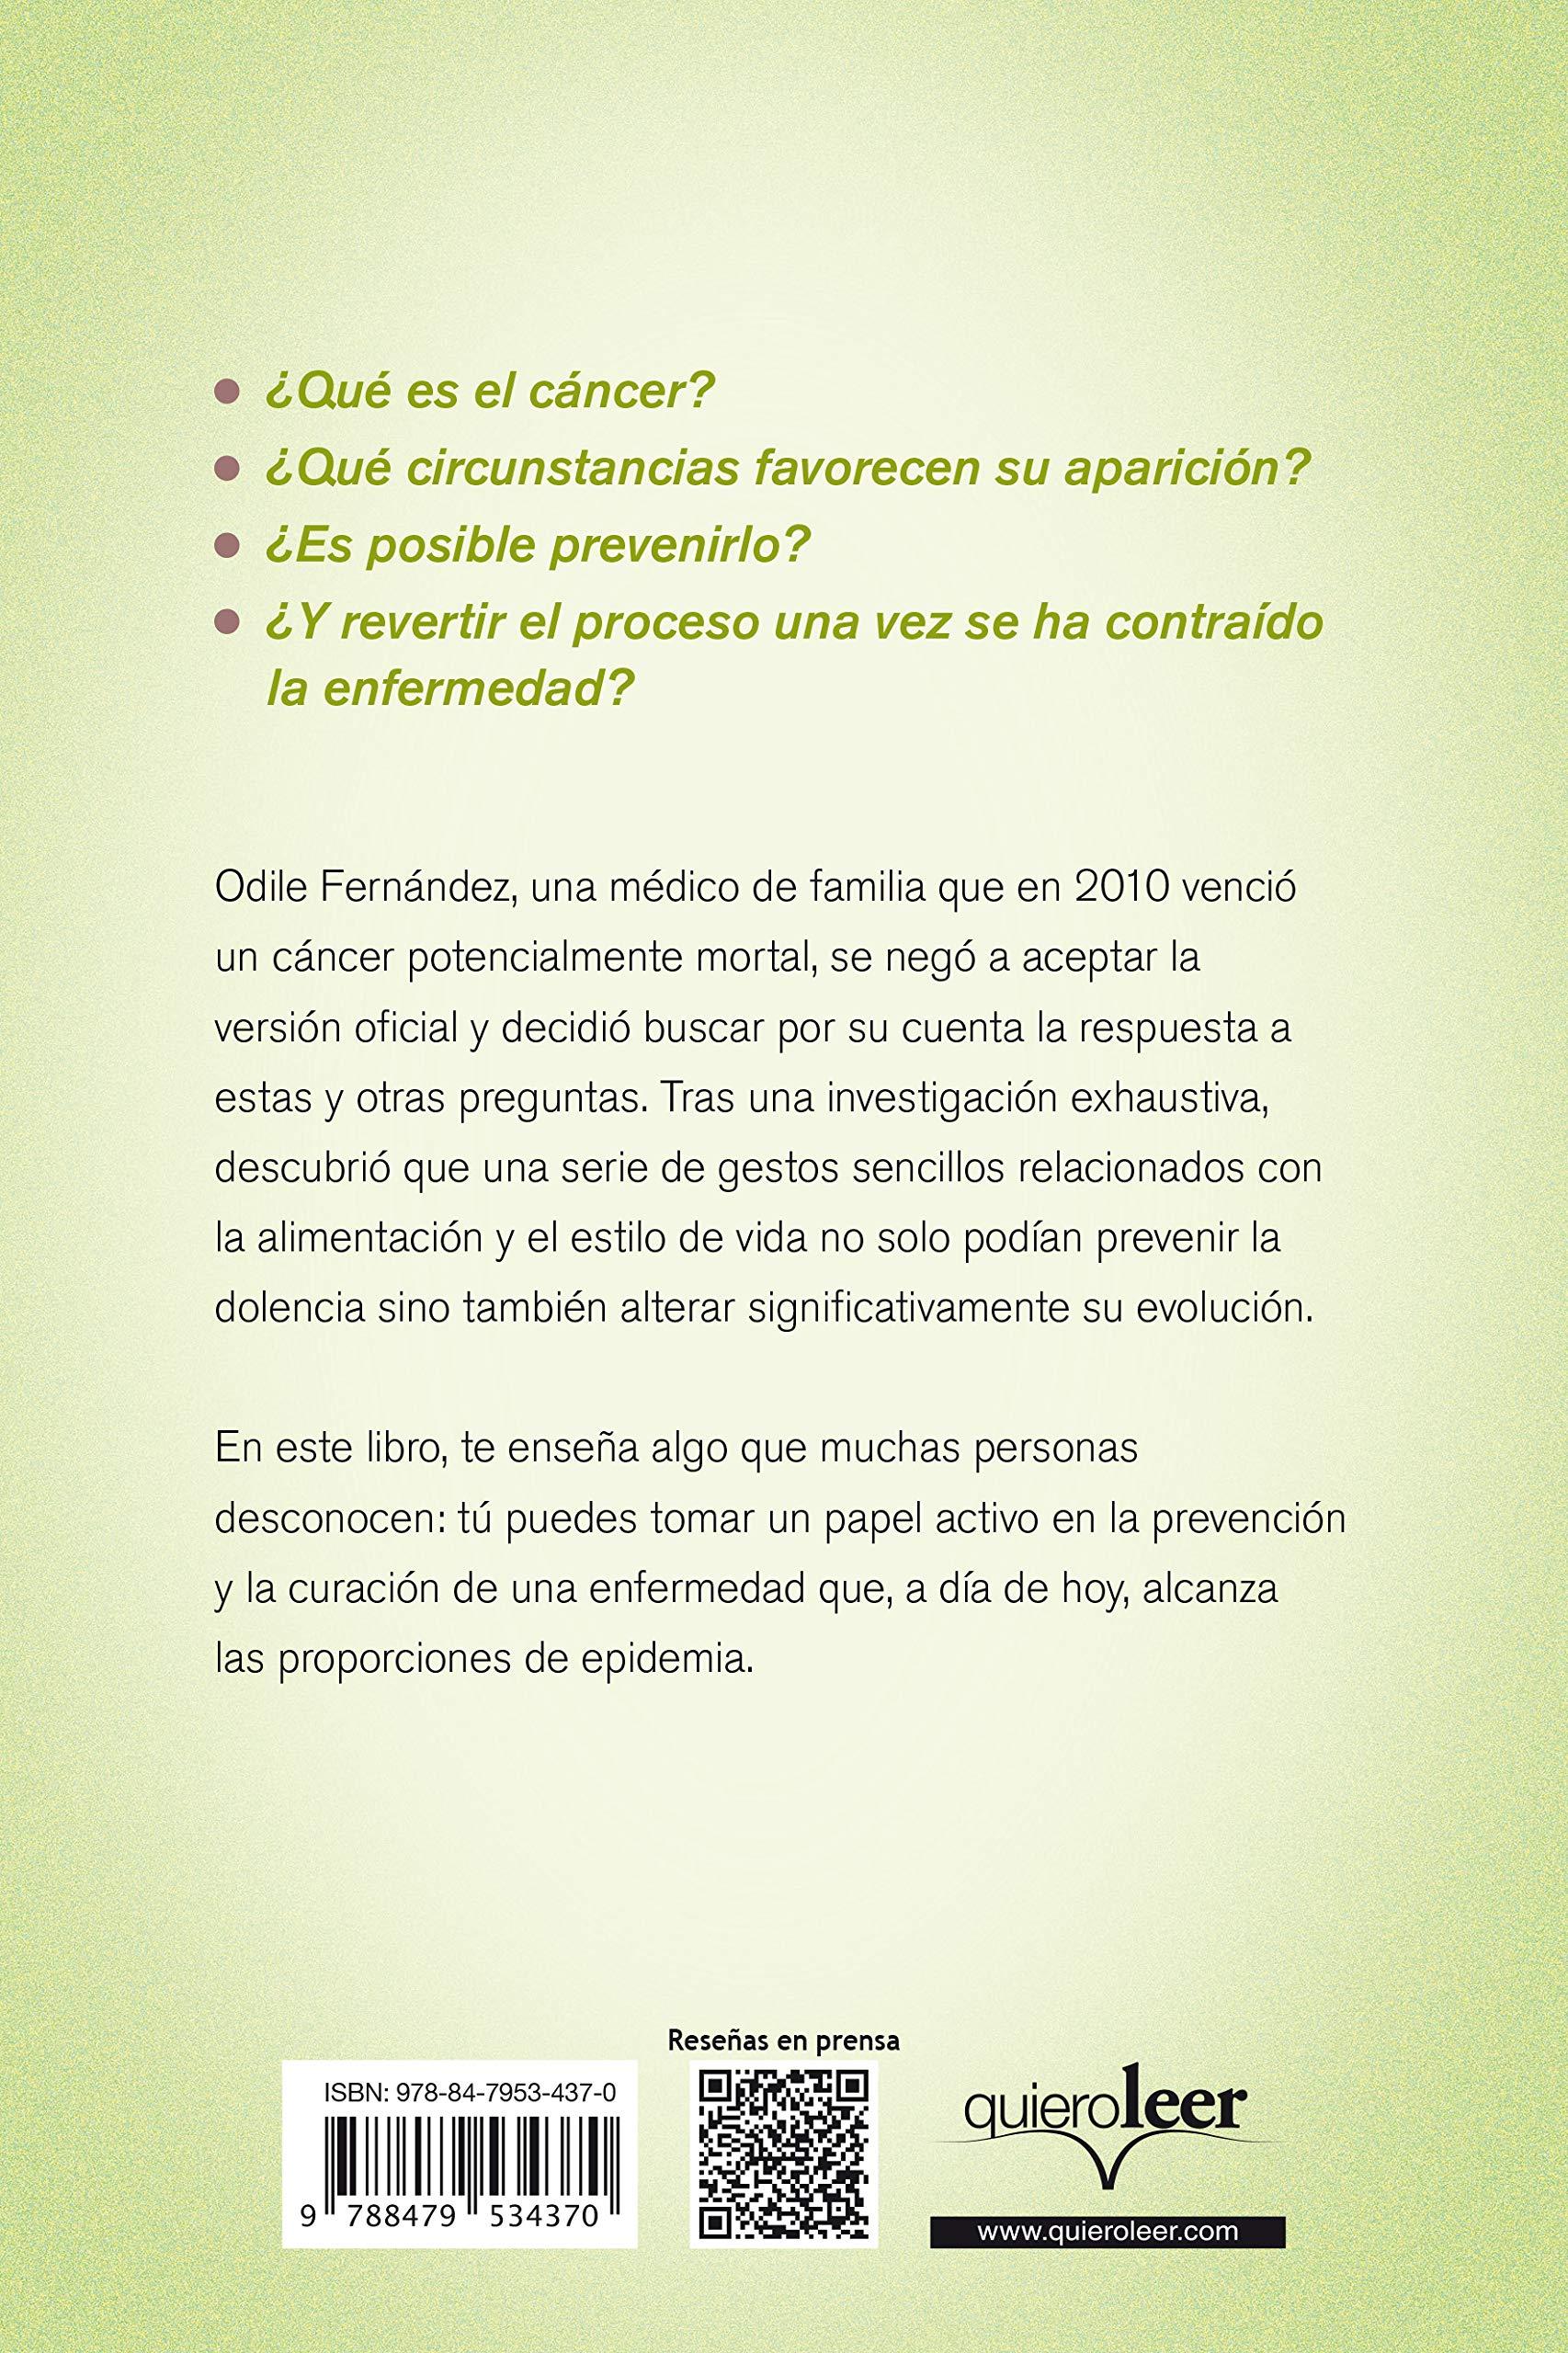 Mis recetas anticancer (Spanish Edition): Odile Fernandez ...